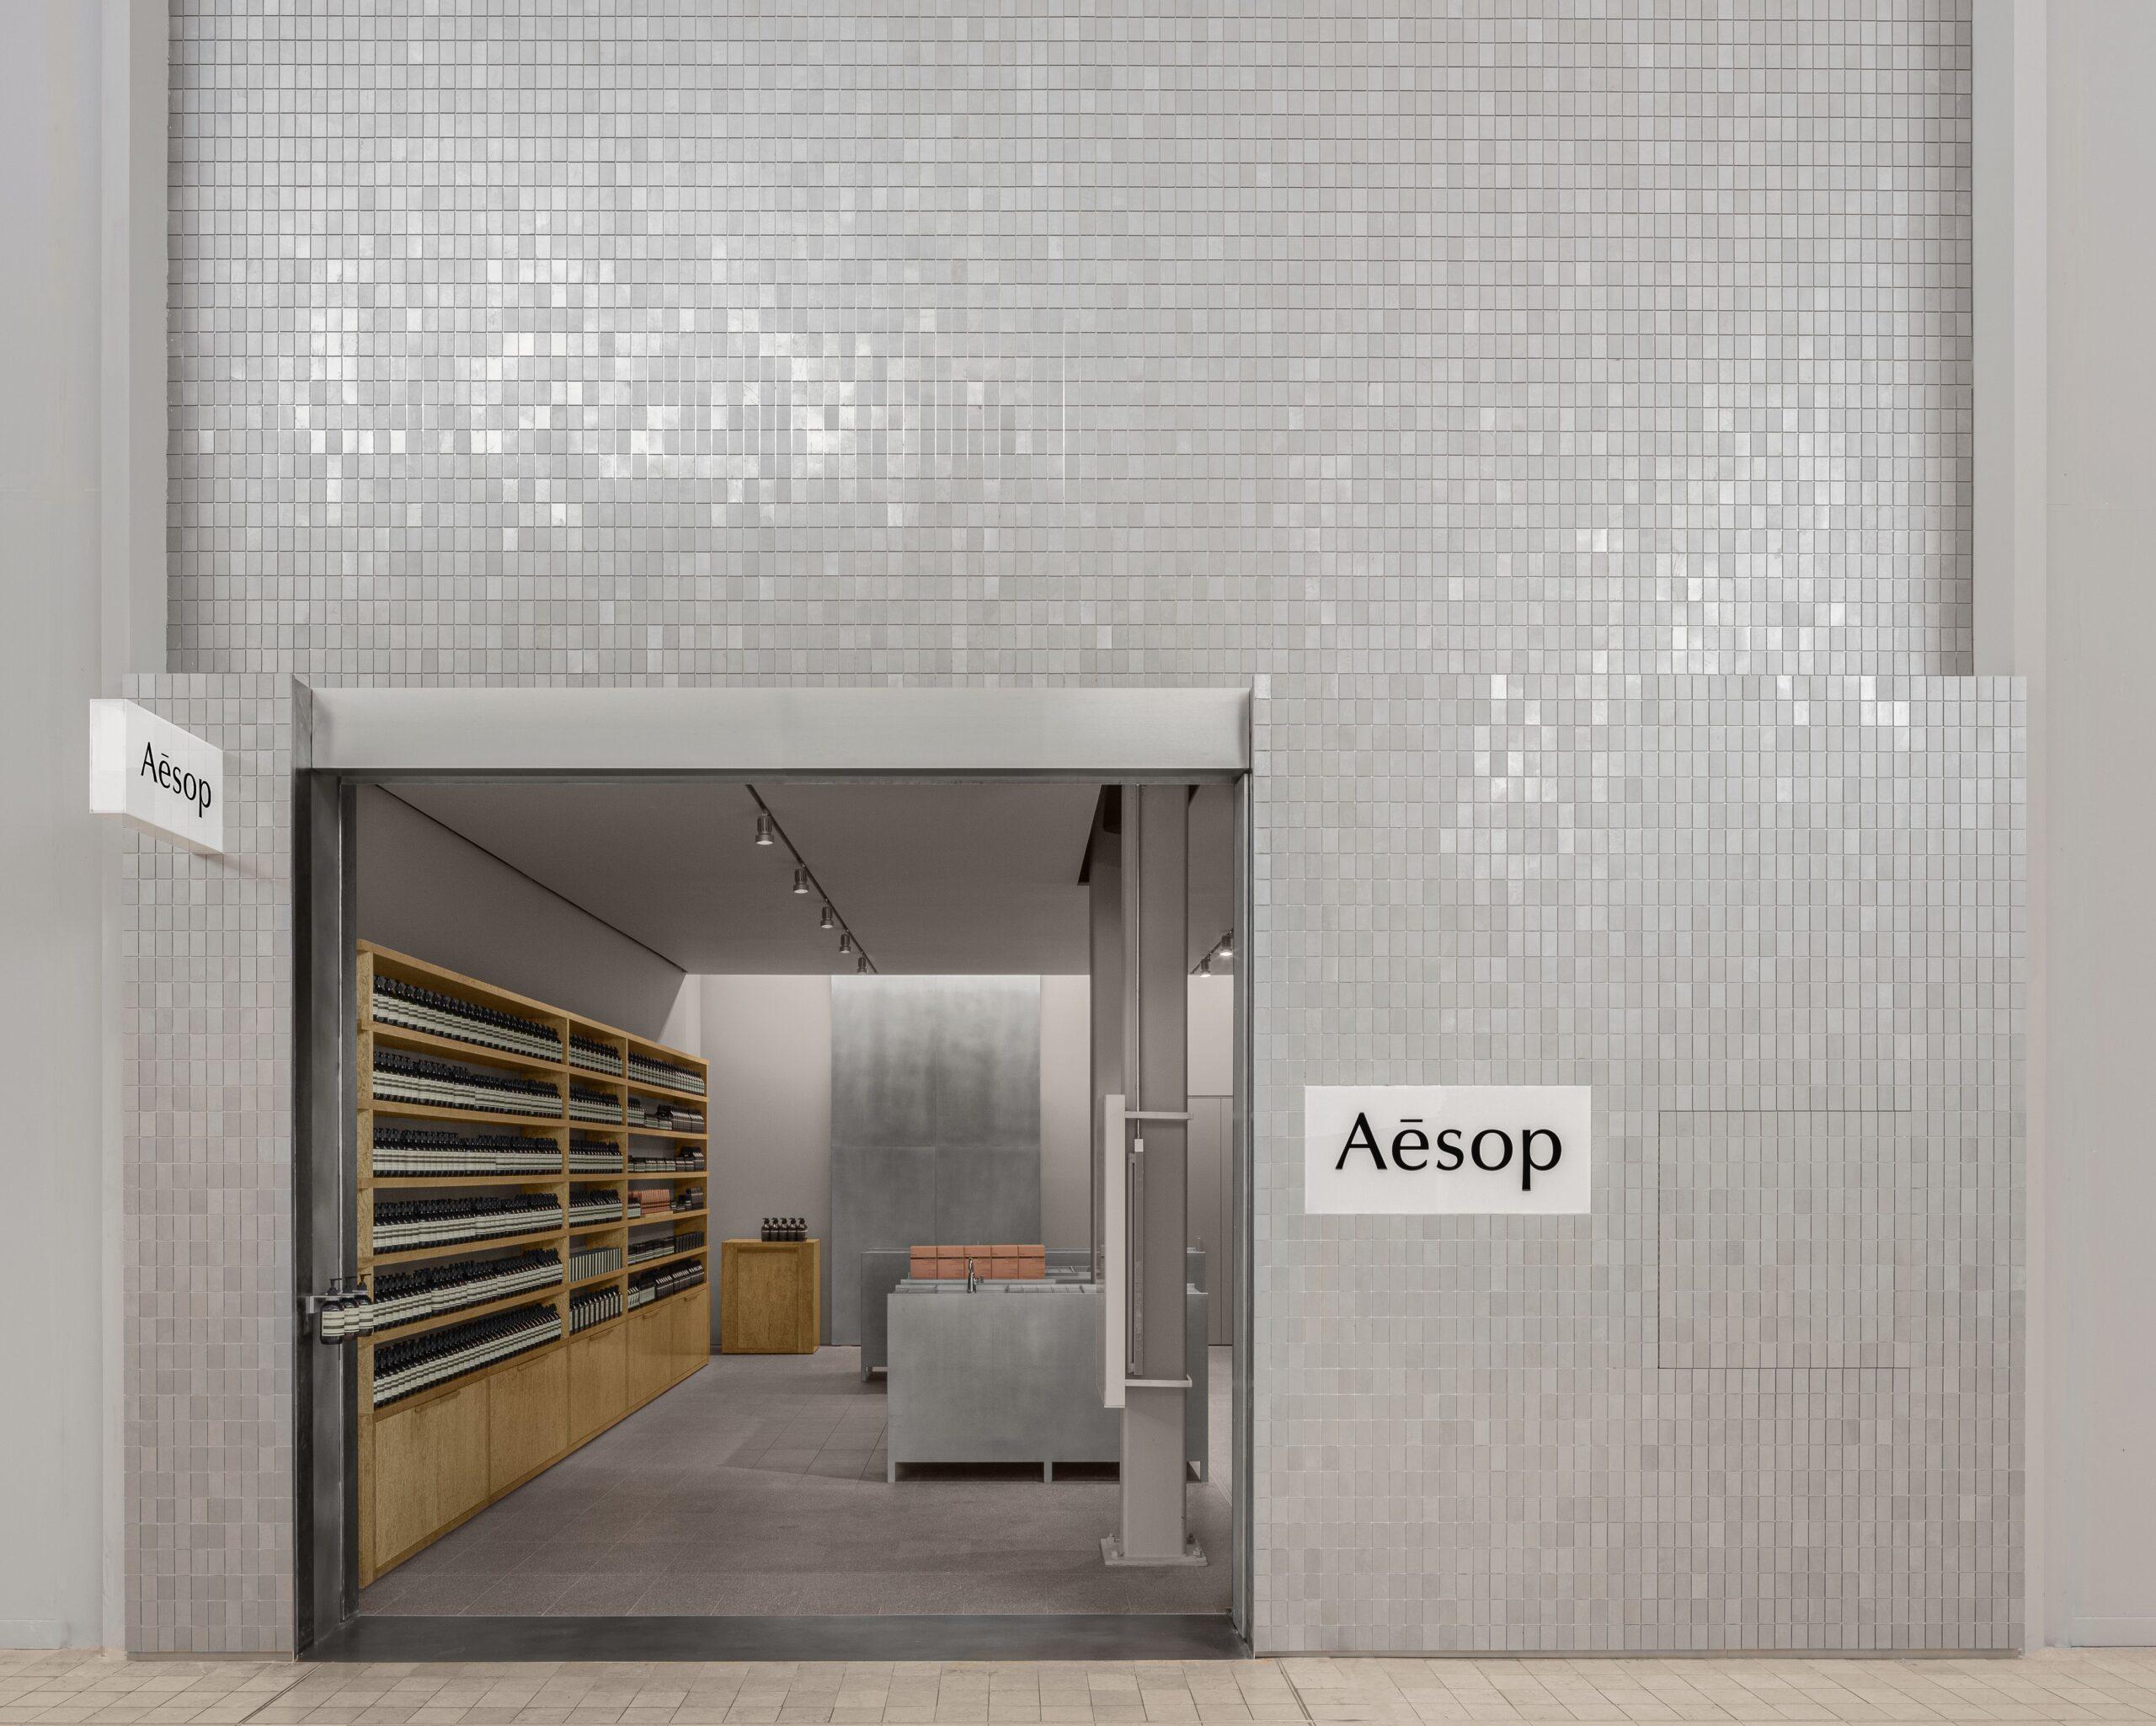 Aesop Storefront